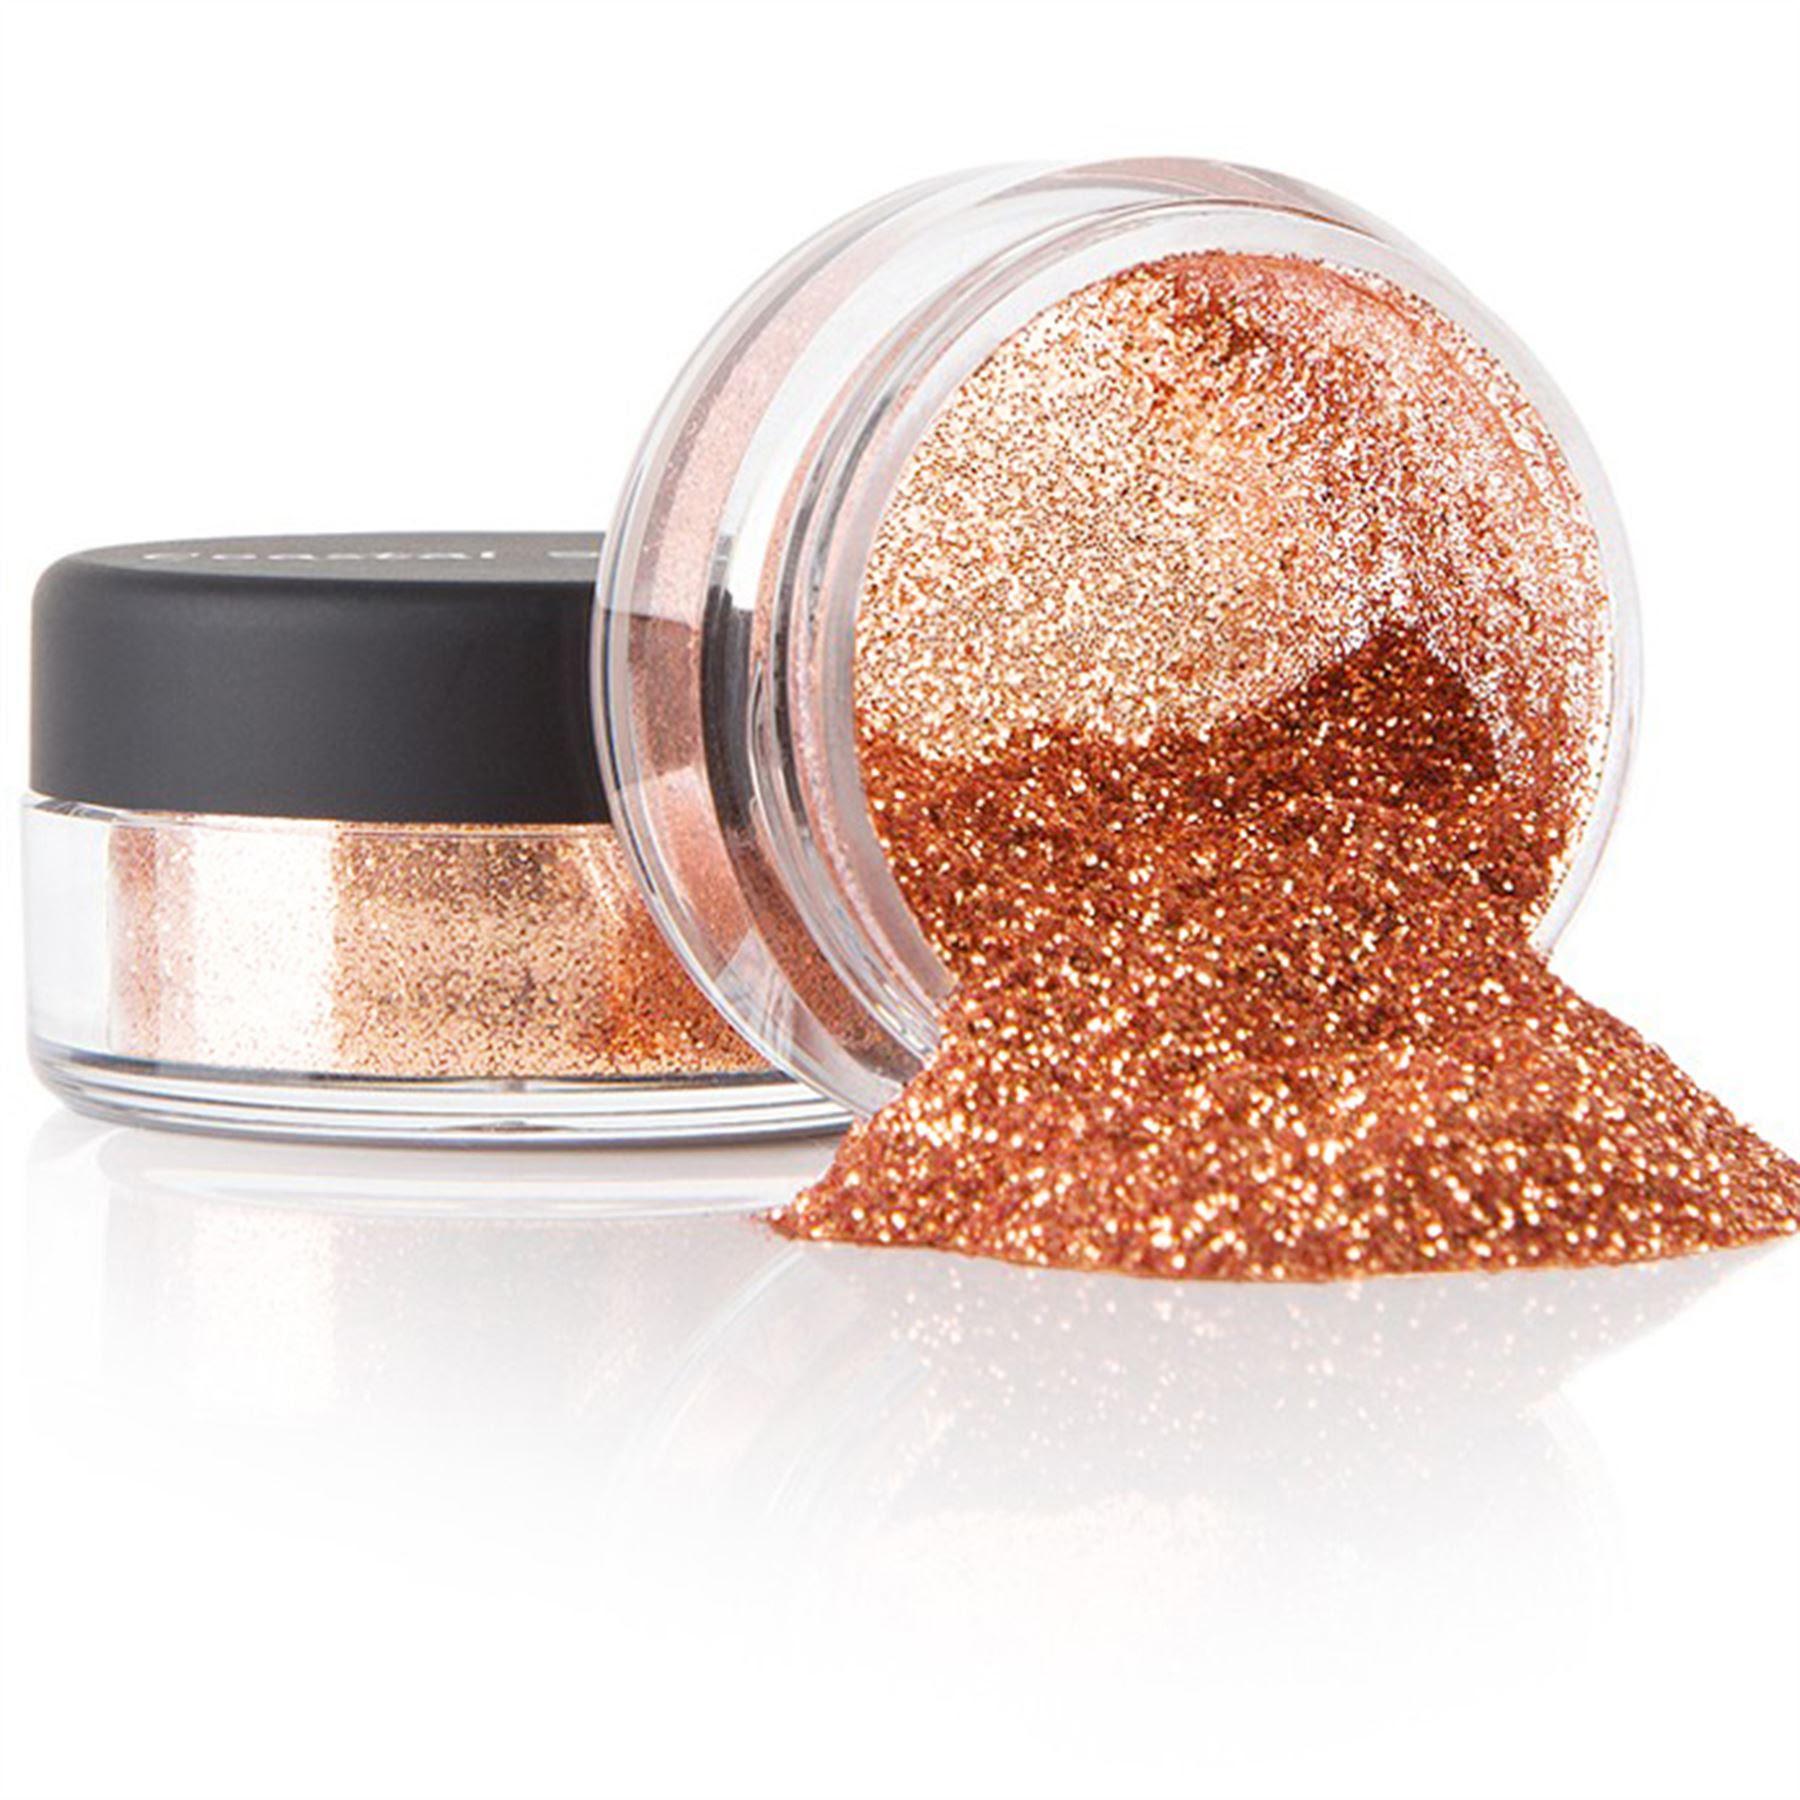 Copper GLITTER POTS FINE HIGH QUALITY HUGE RANGE OF ...